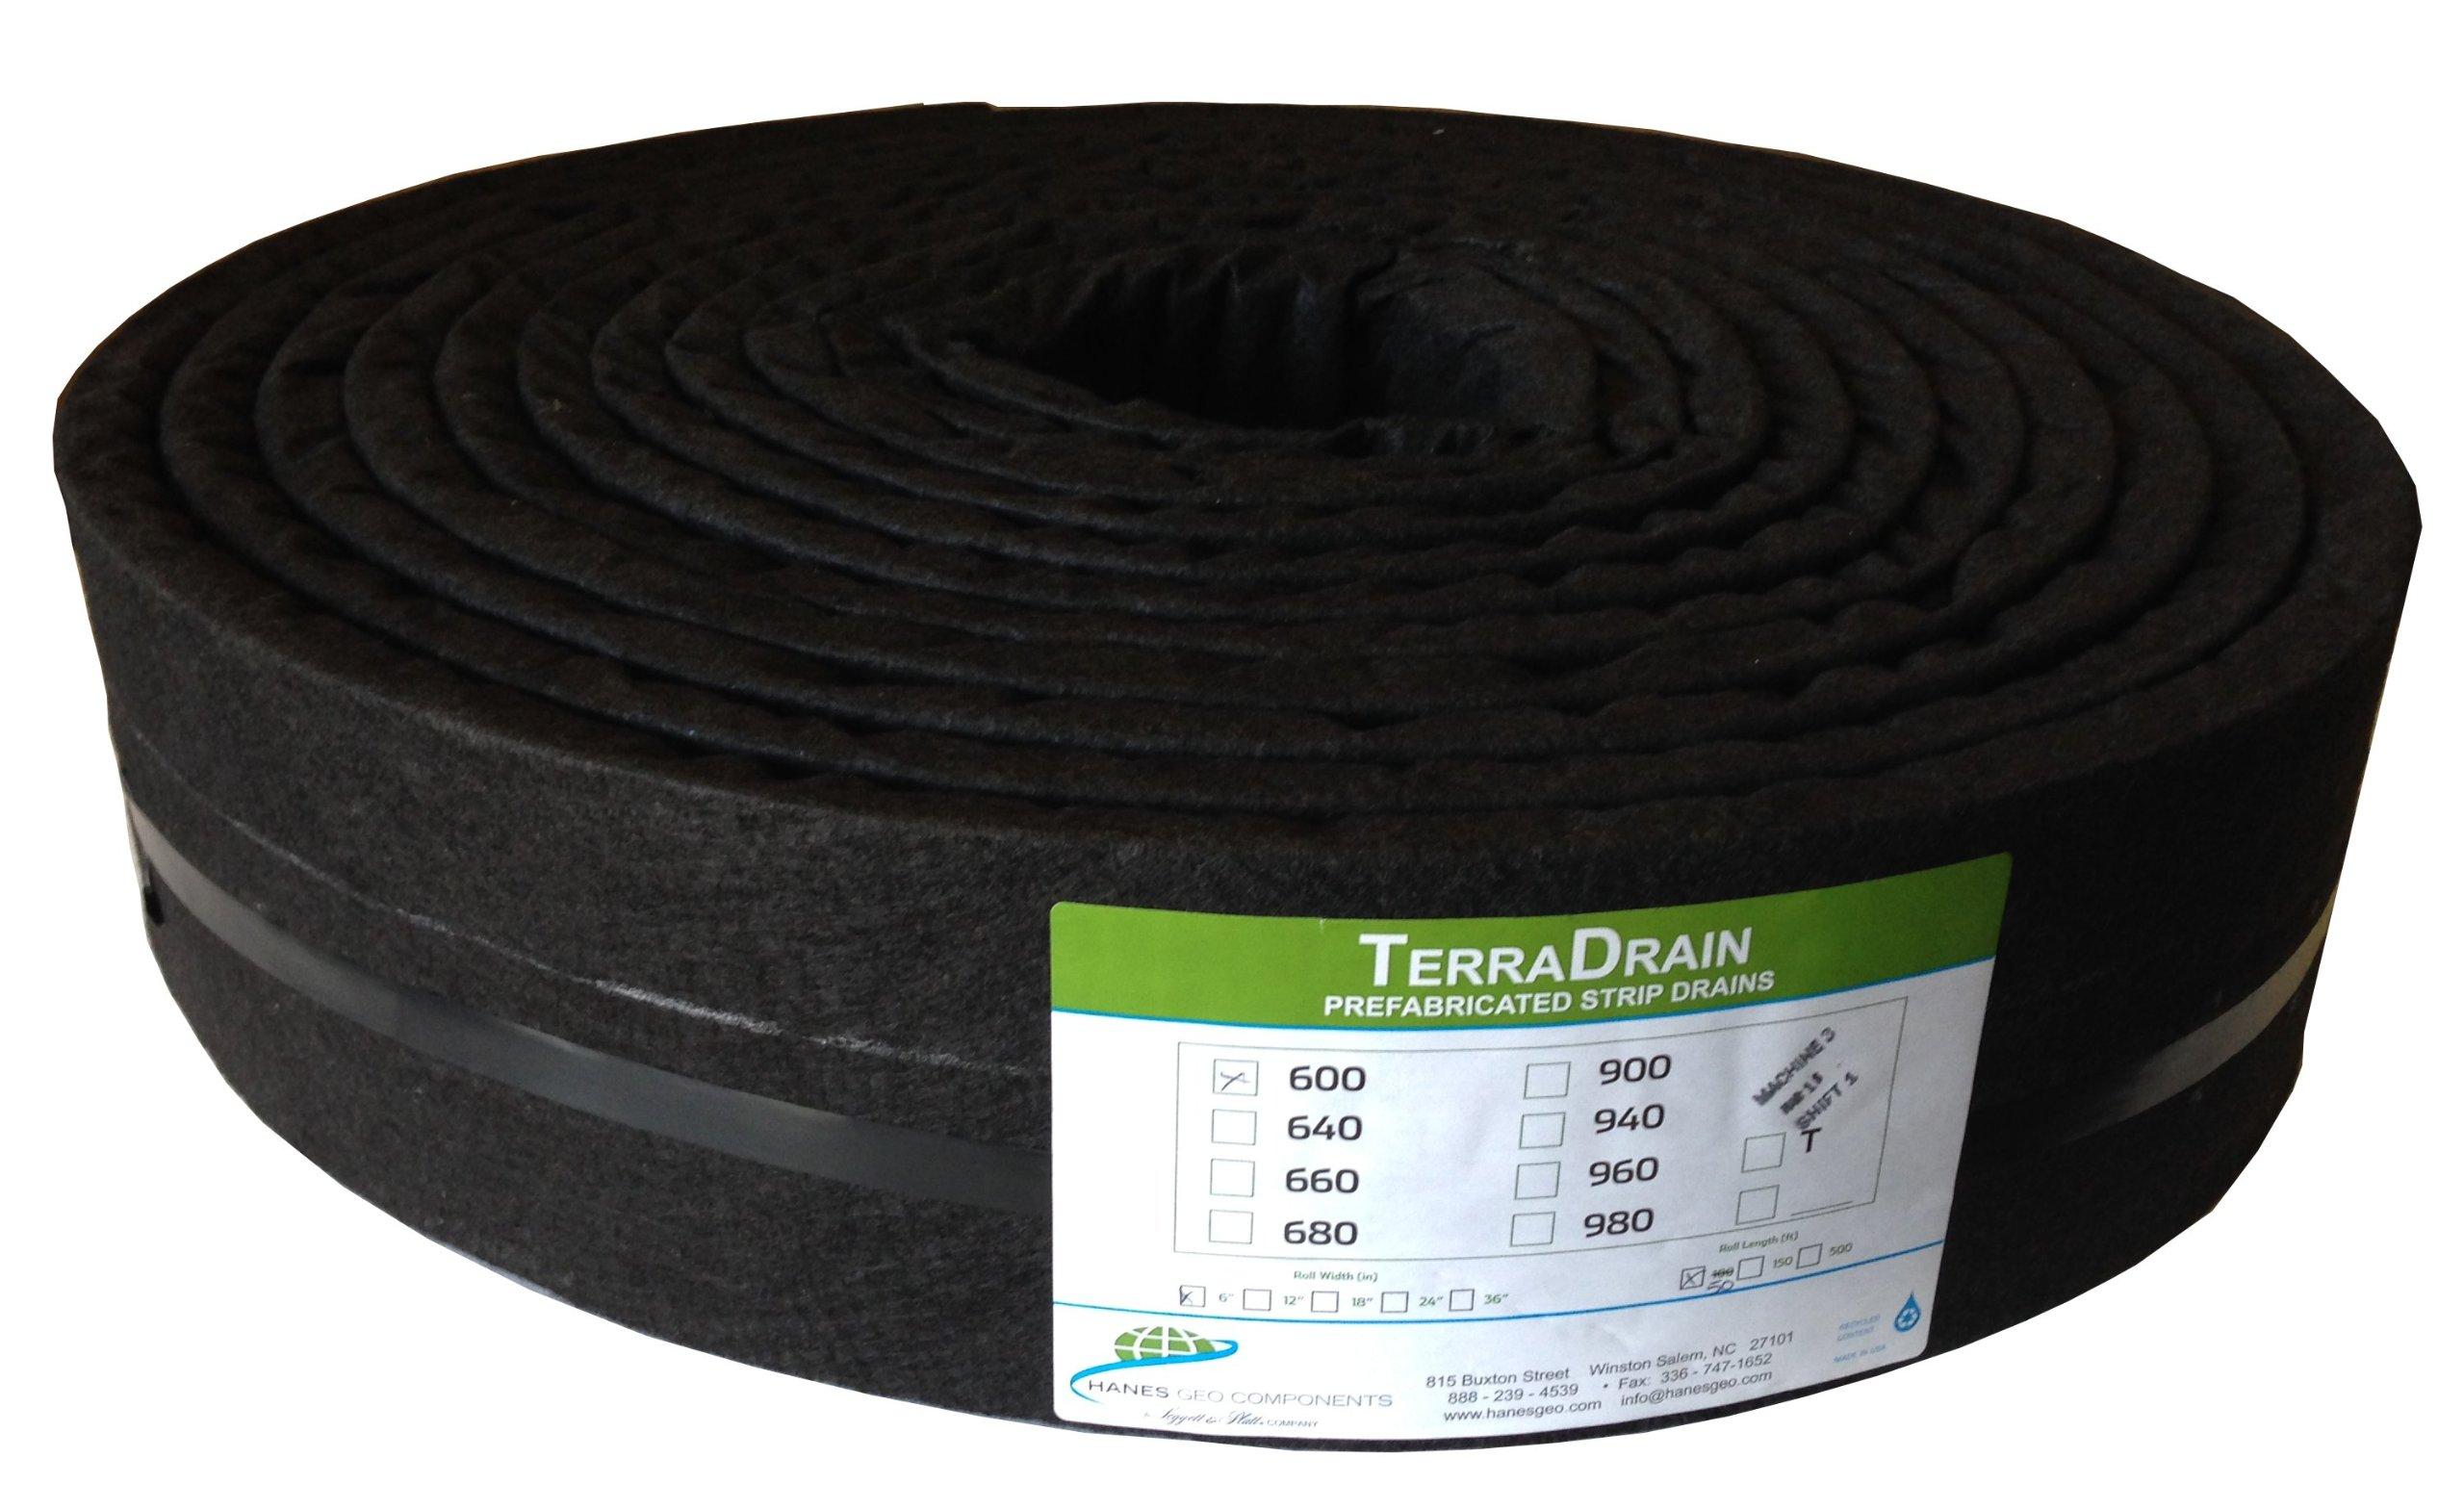 Hanes Geo Components 32431 TerraDrain Strip Drain, 6-Inch by 50-Feet